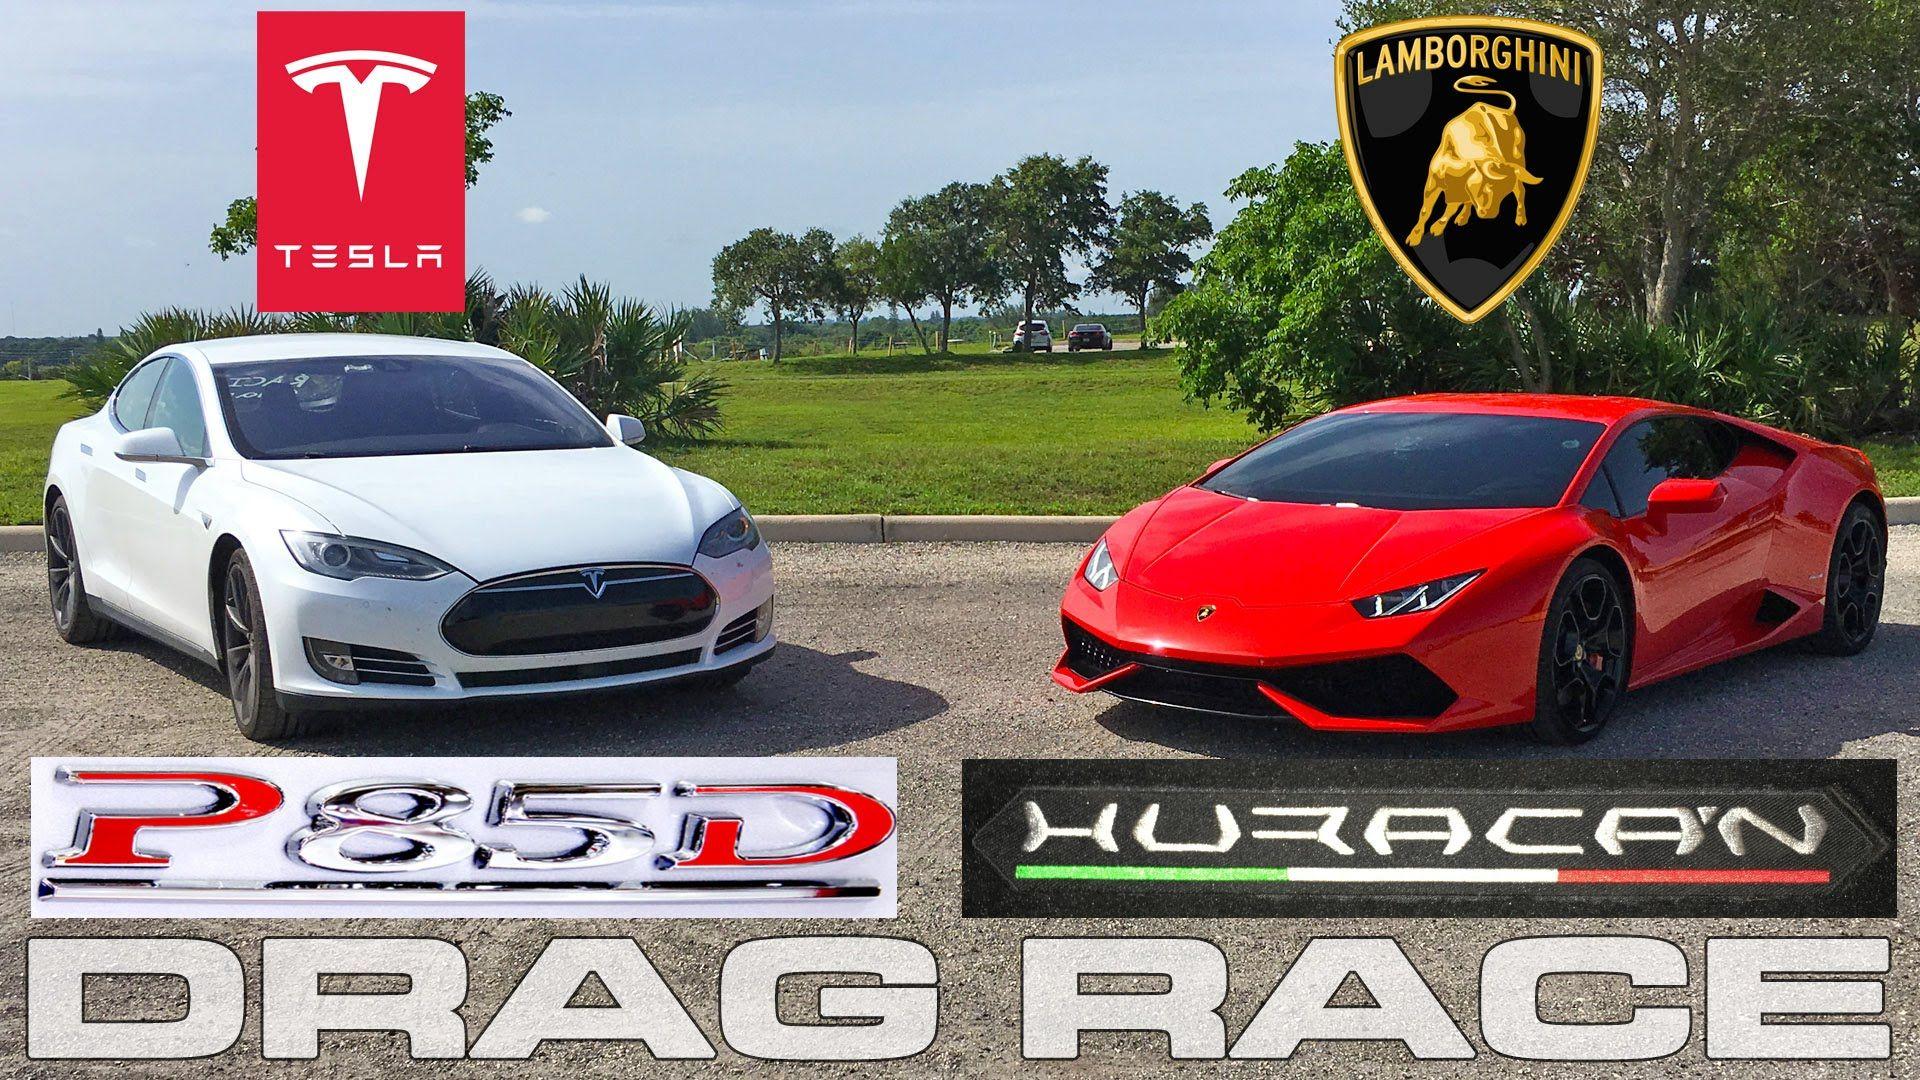 Drag Race Lamborghini Huracan Lp610 4 Vs Tesla Model S P85d Ludicrous